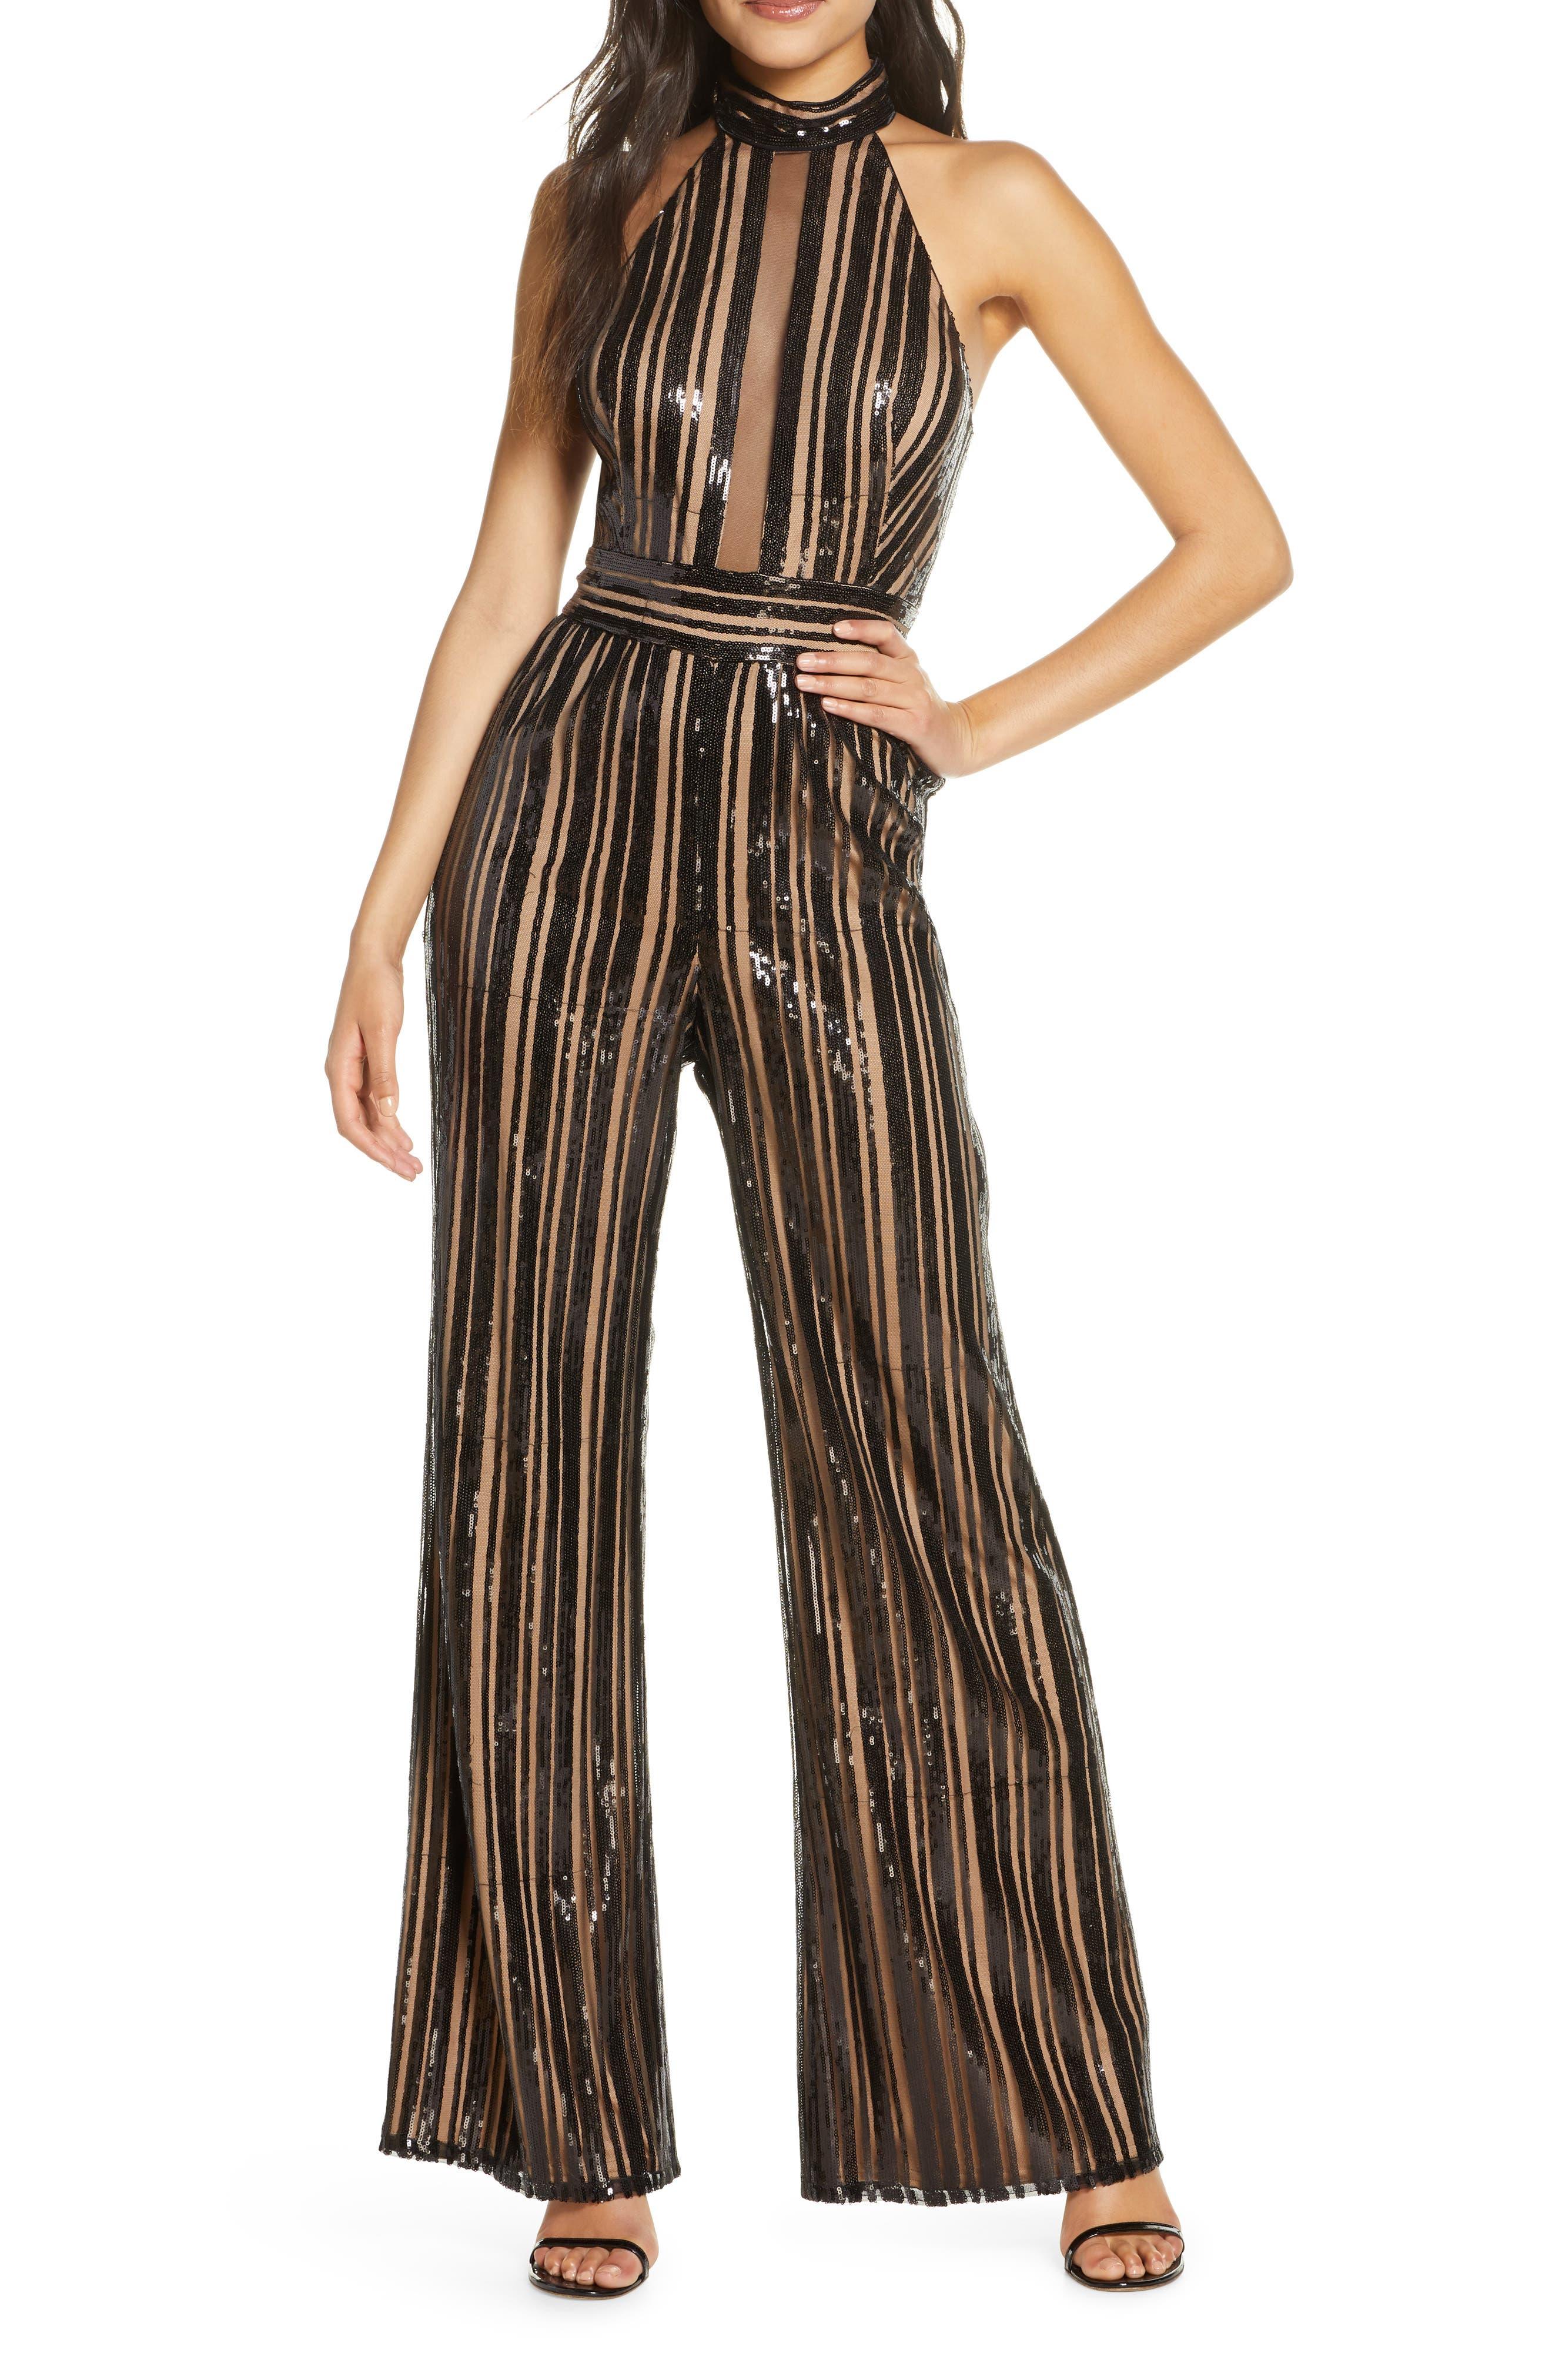 70s Jumpsuit | Disco Jumpsuits, Sequin Rompers Womens Sho Sequin Stripe Sleeveless Jumpsuit $288.00 AT vintagedancer.com